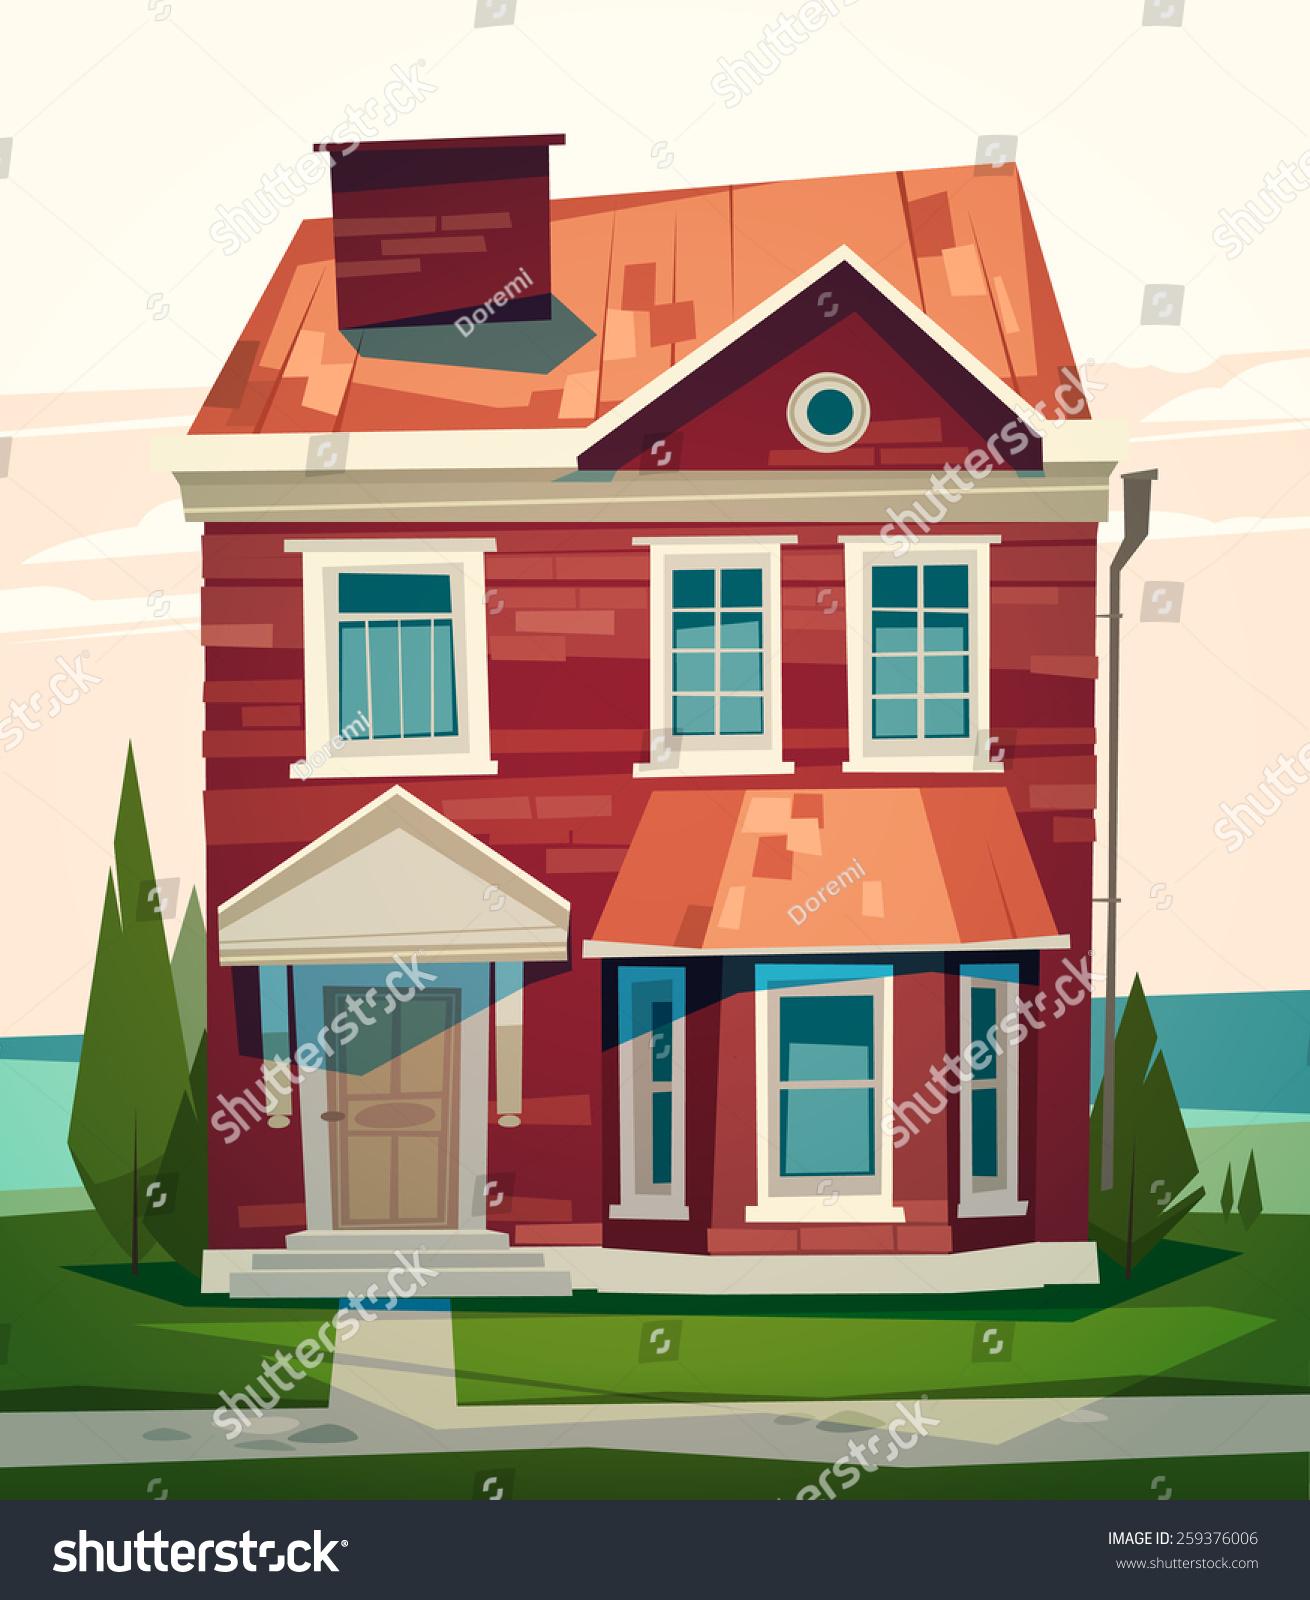 English house facade vector illustration stock vector for English house music